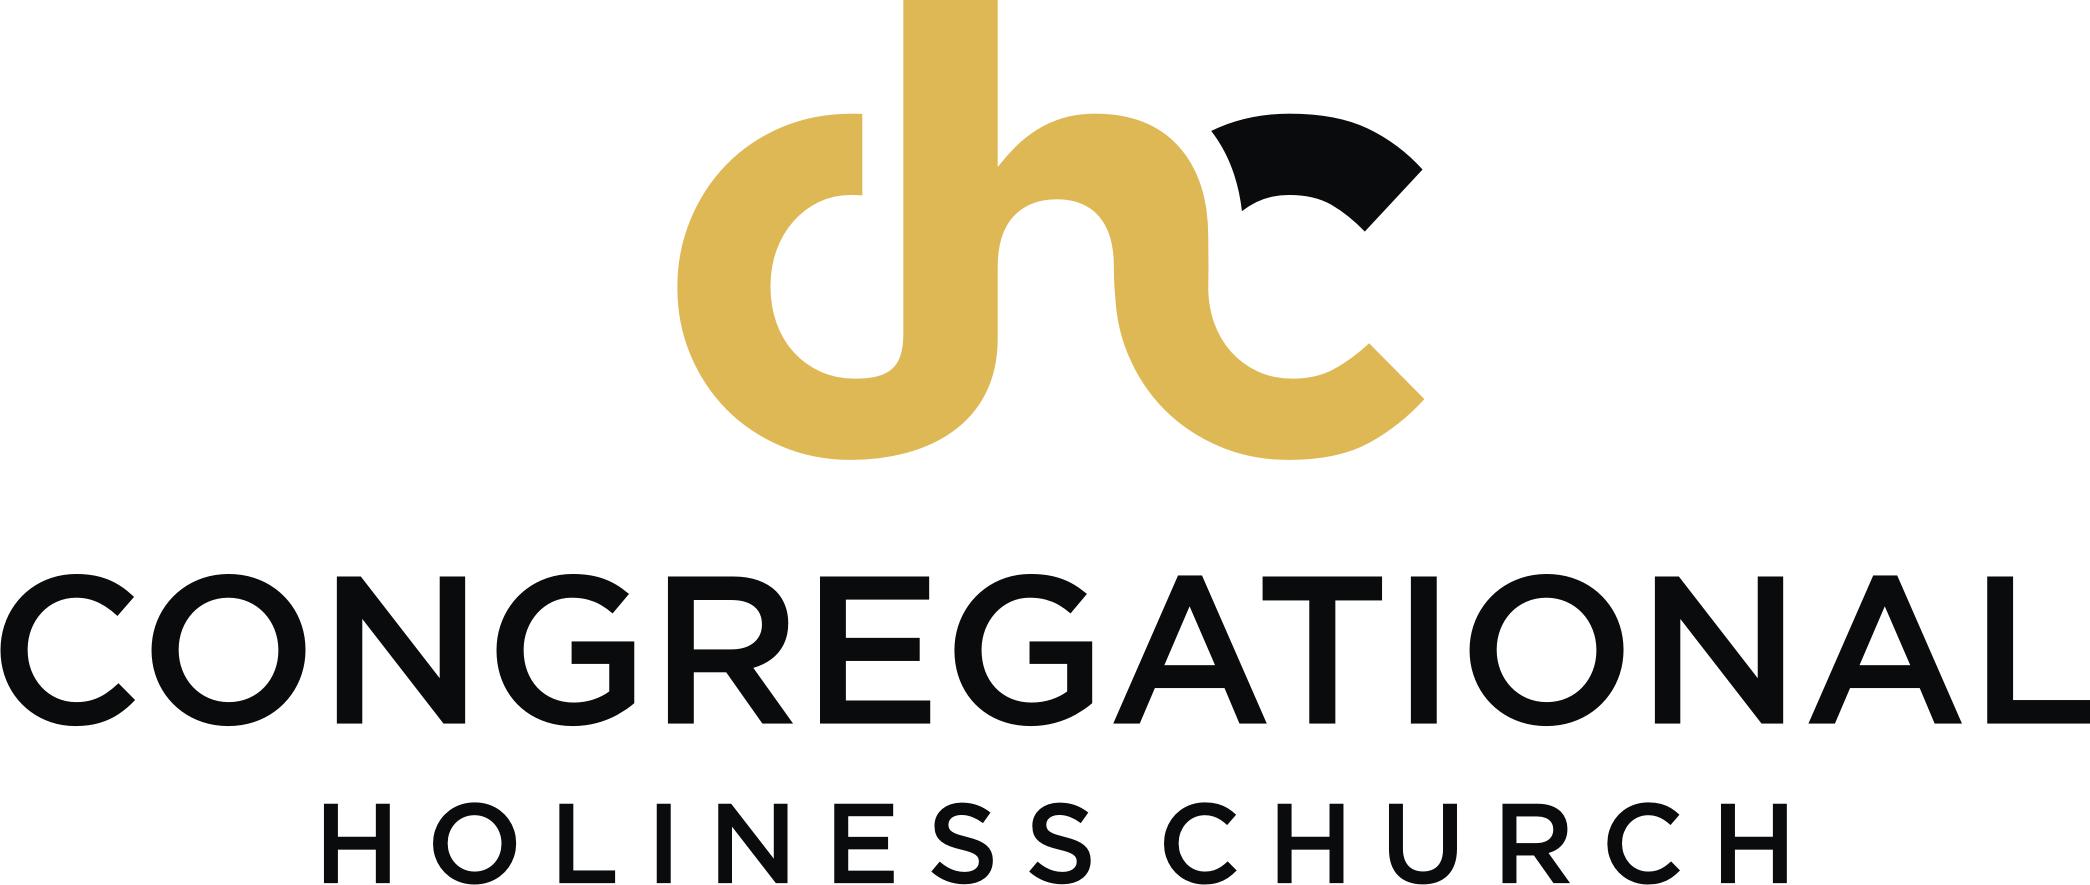 logo Congregational Holiness Church gold black